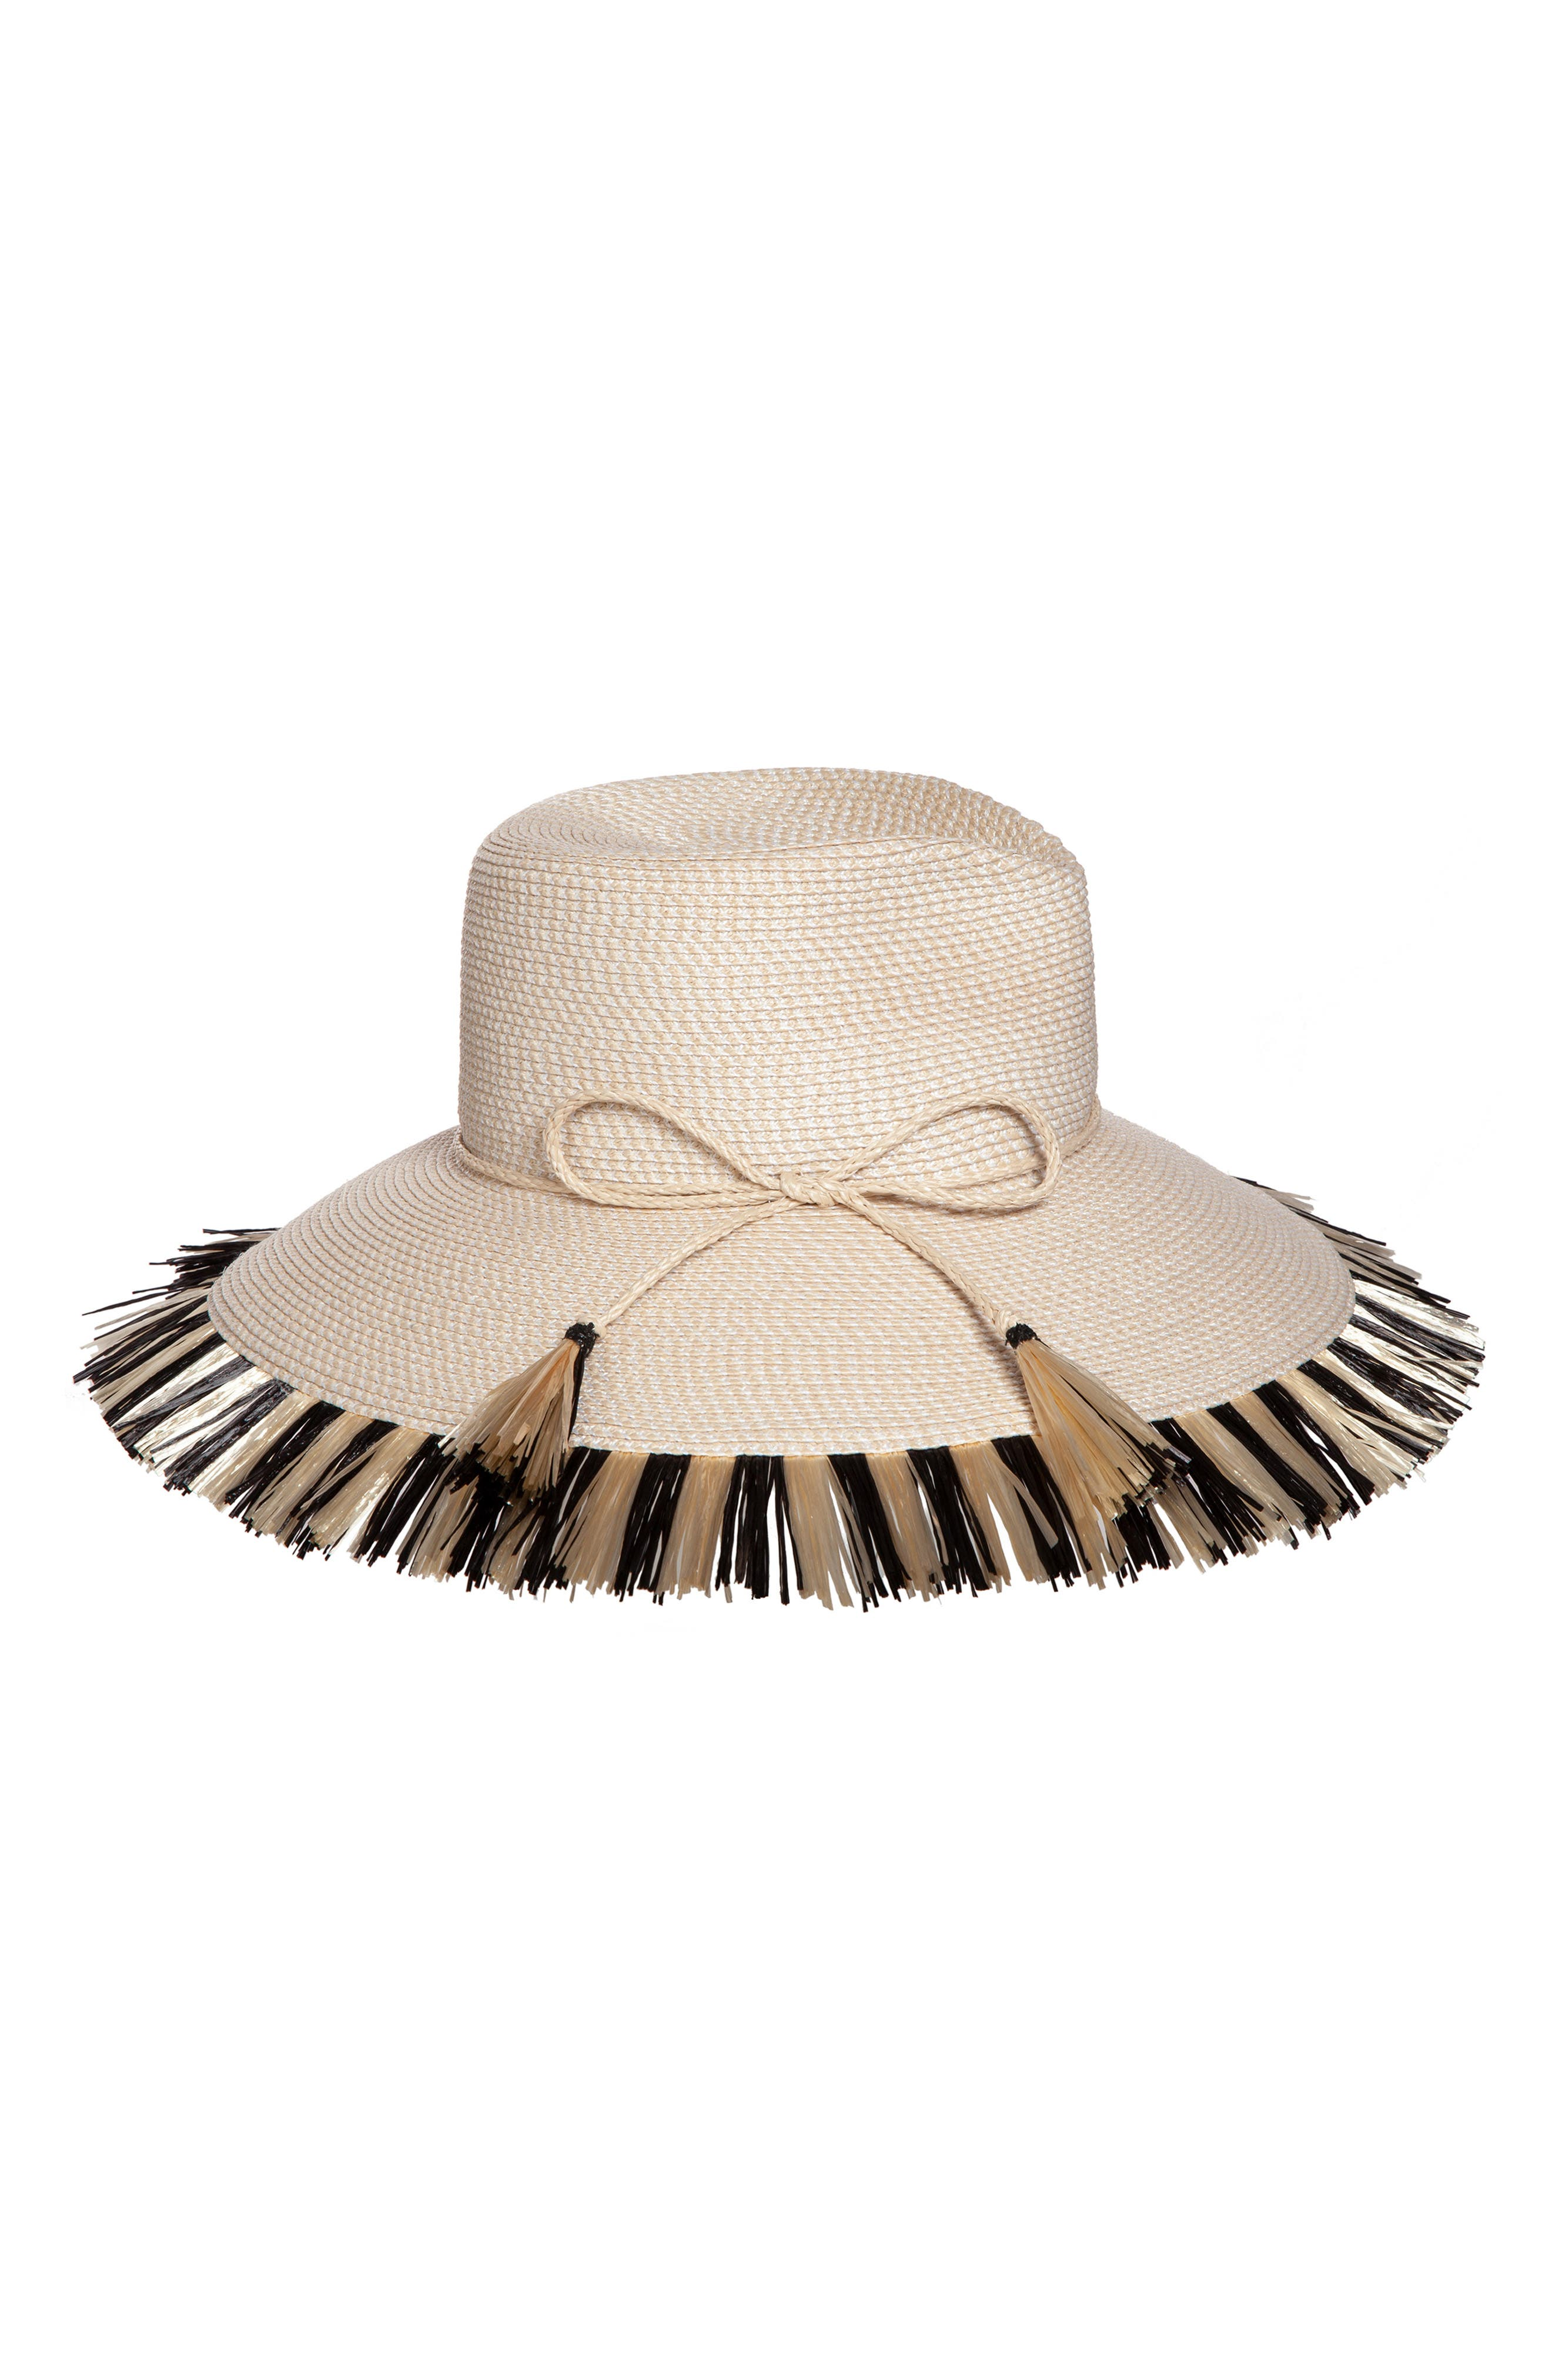 d69ff058e59 Eric Javits Antigua Squishee Tropical Sun Hat - Black In Cream  Black ...